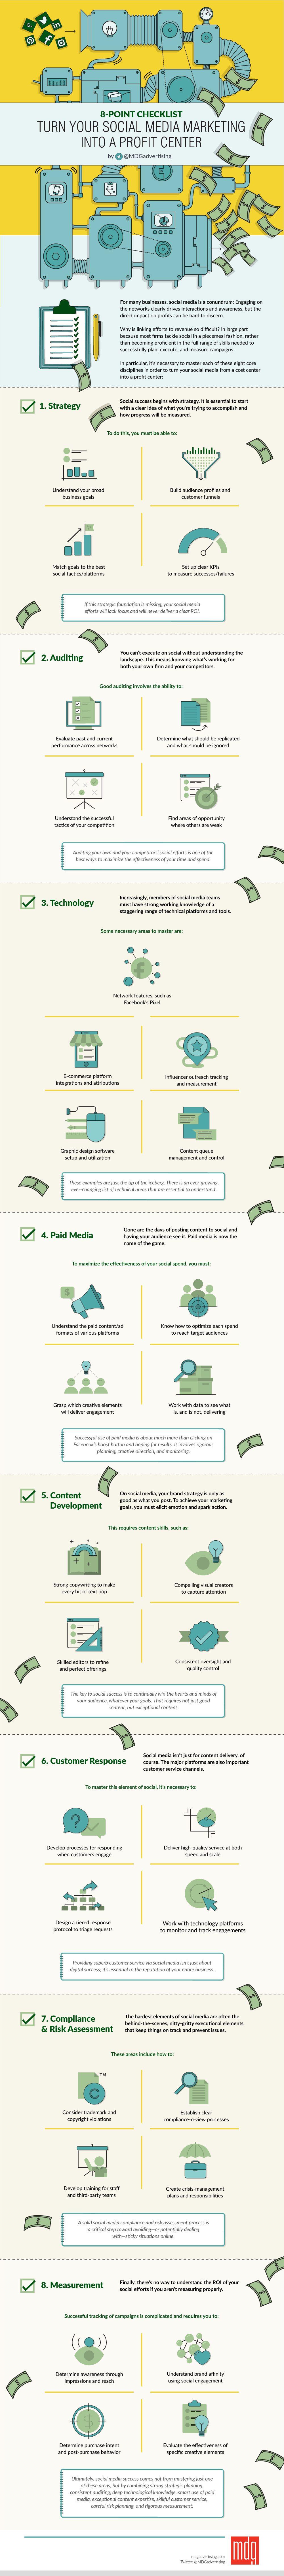 8 Steps to a Profitable Social Media Marketing Strategy